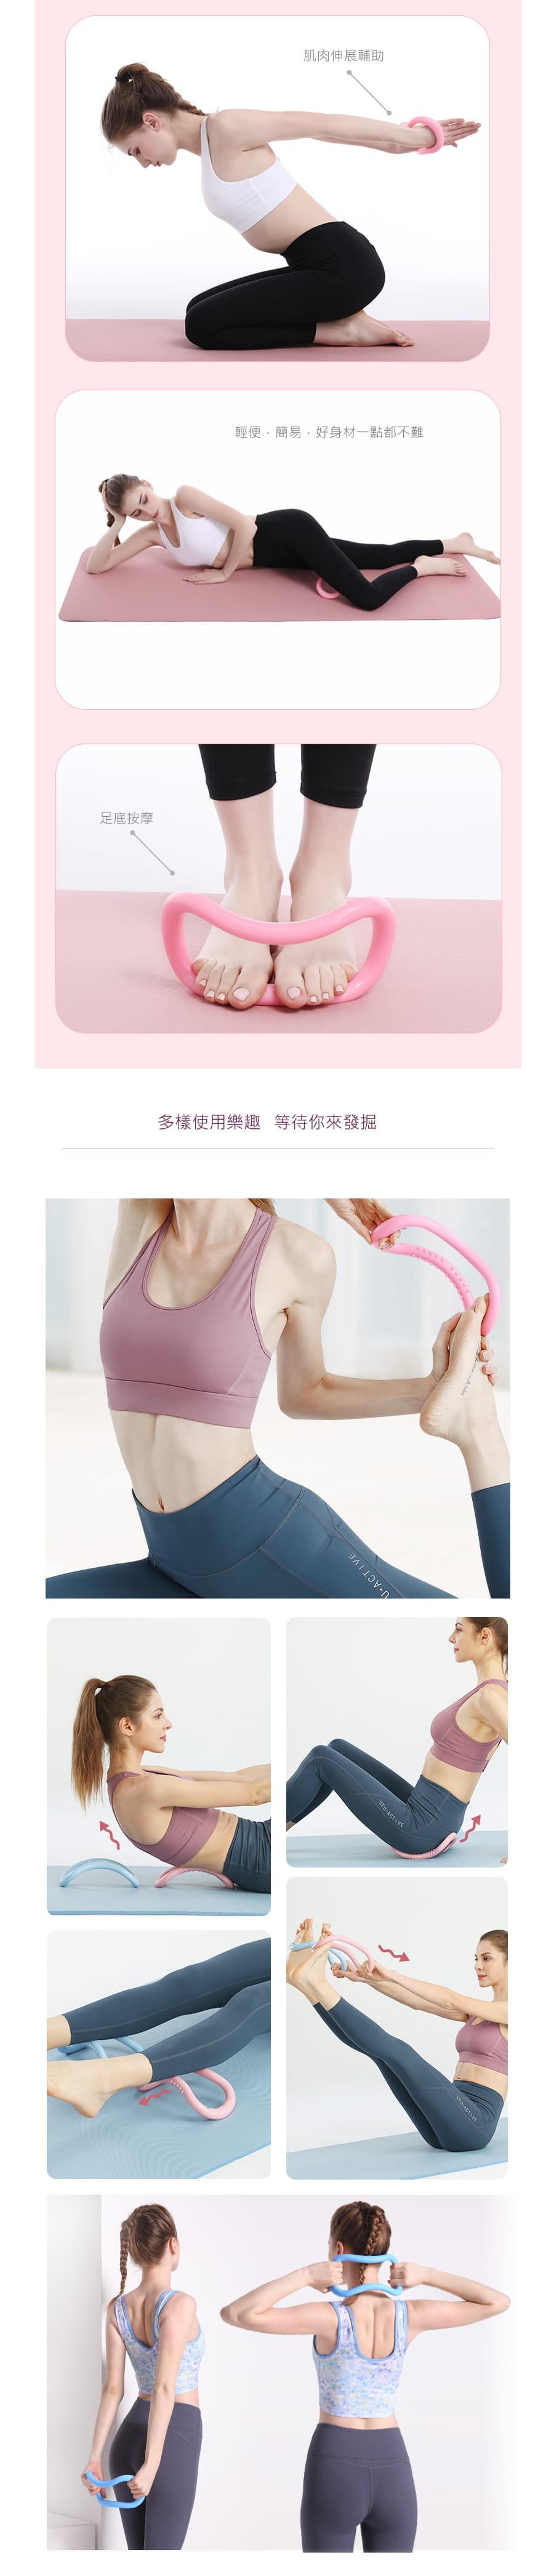 【Un-Sport高機能】健身按摩瑜珈環/開肩瘦背/普拉提斯伸展環-超值2入 3